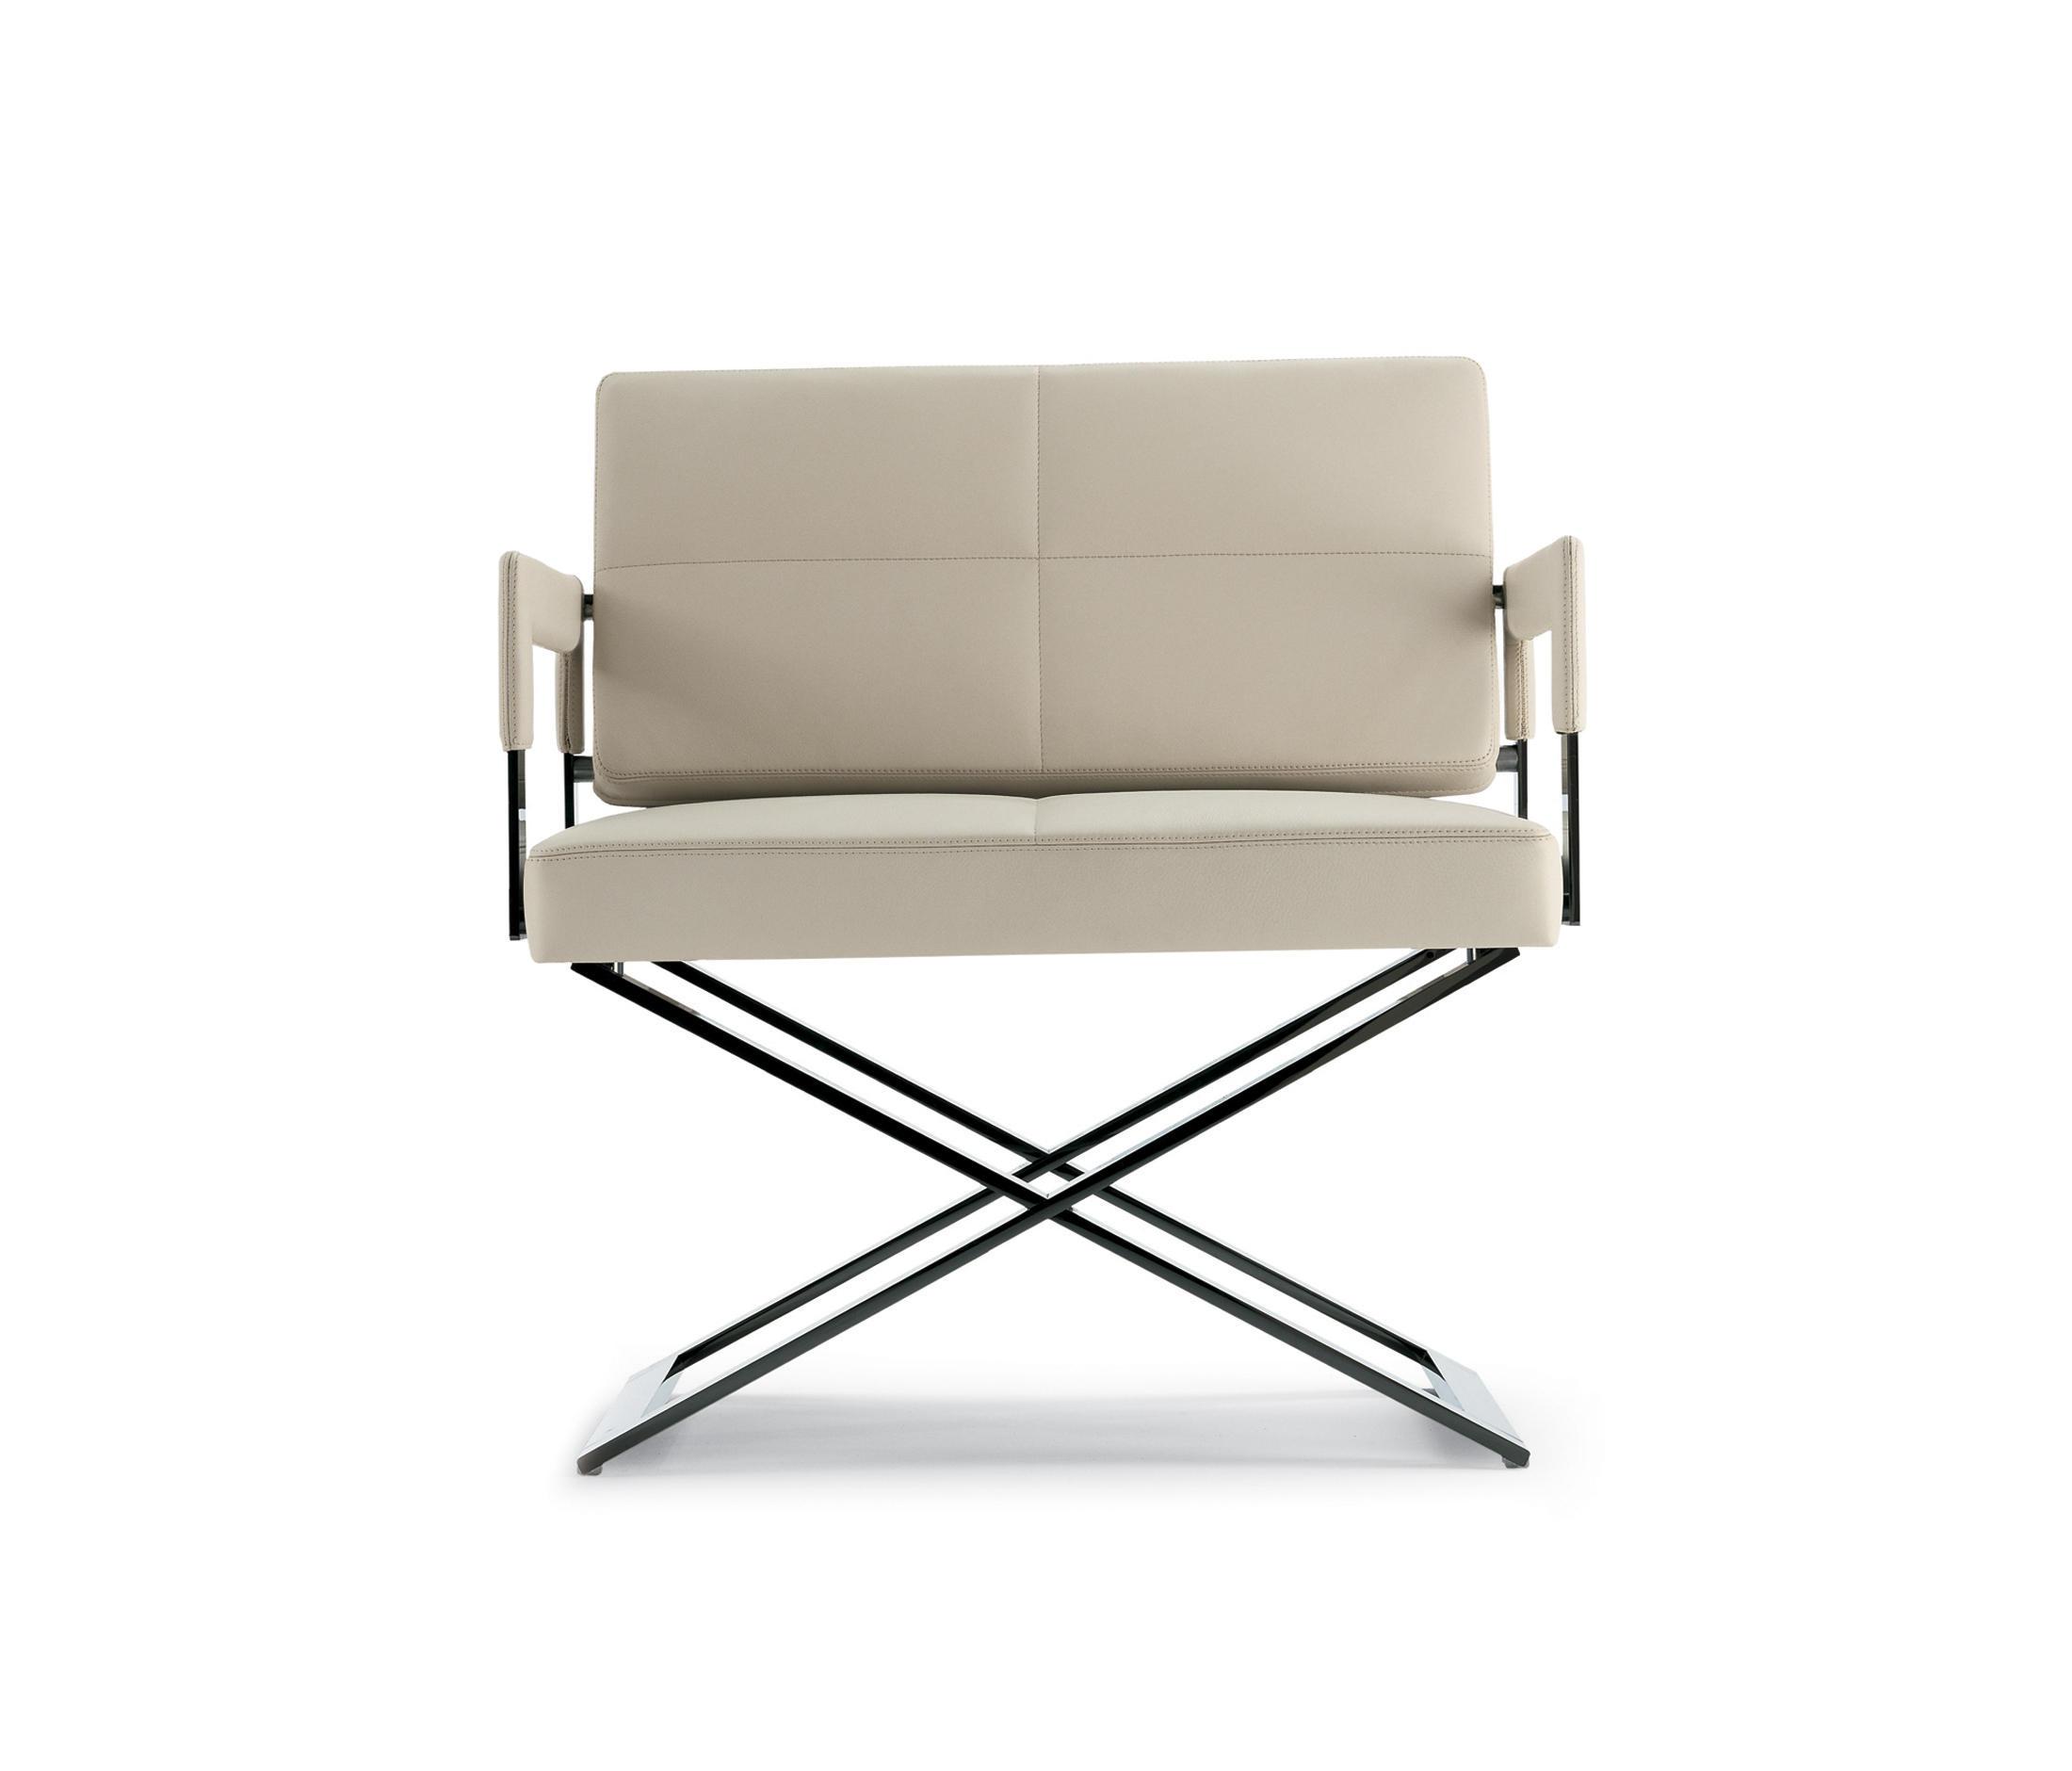 aster x fauteuils d 39 attente de poltrona frau architonic. Black Bedroom Furniture Sets. Home Design Ideas